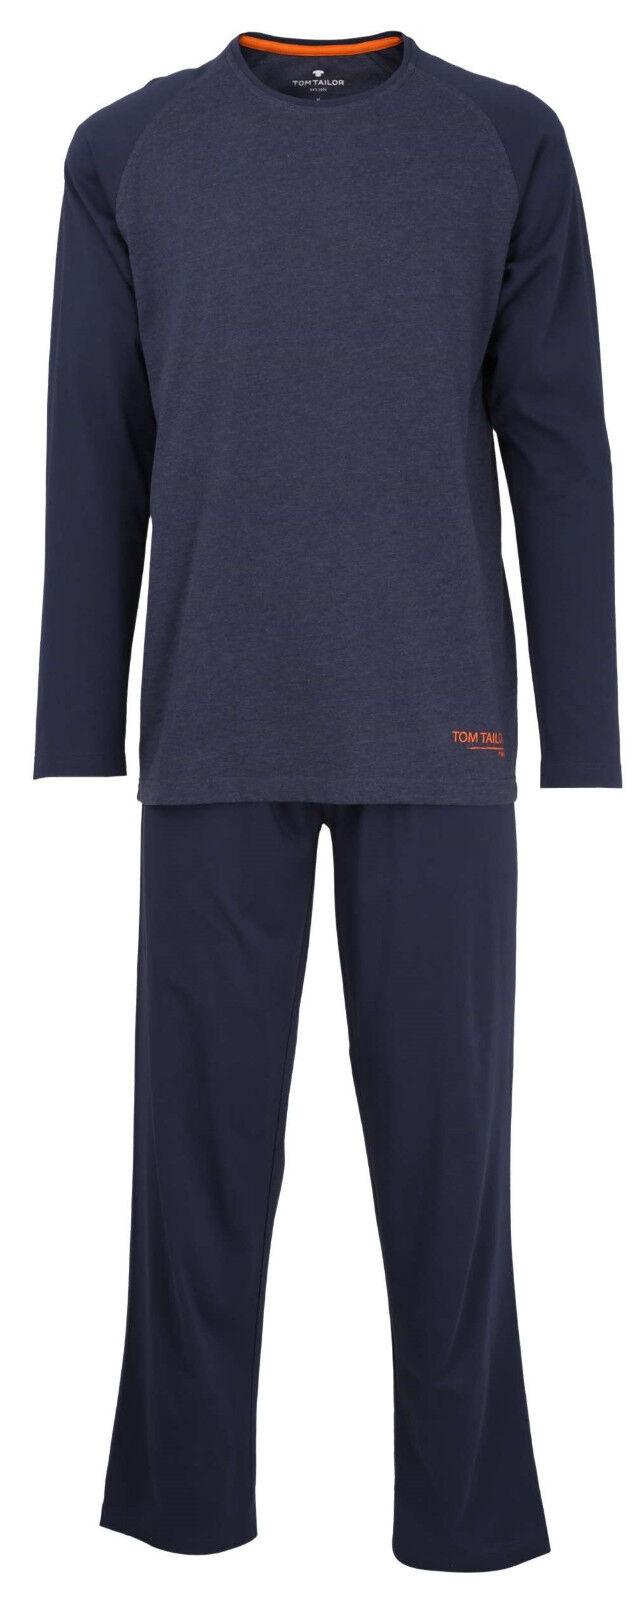 TOM TAILOR Schlafanzug Gr. XXL/56 Jersey-Pyjama blau U-Ausschnitt Raglanärmel